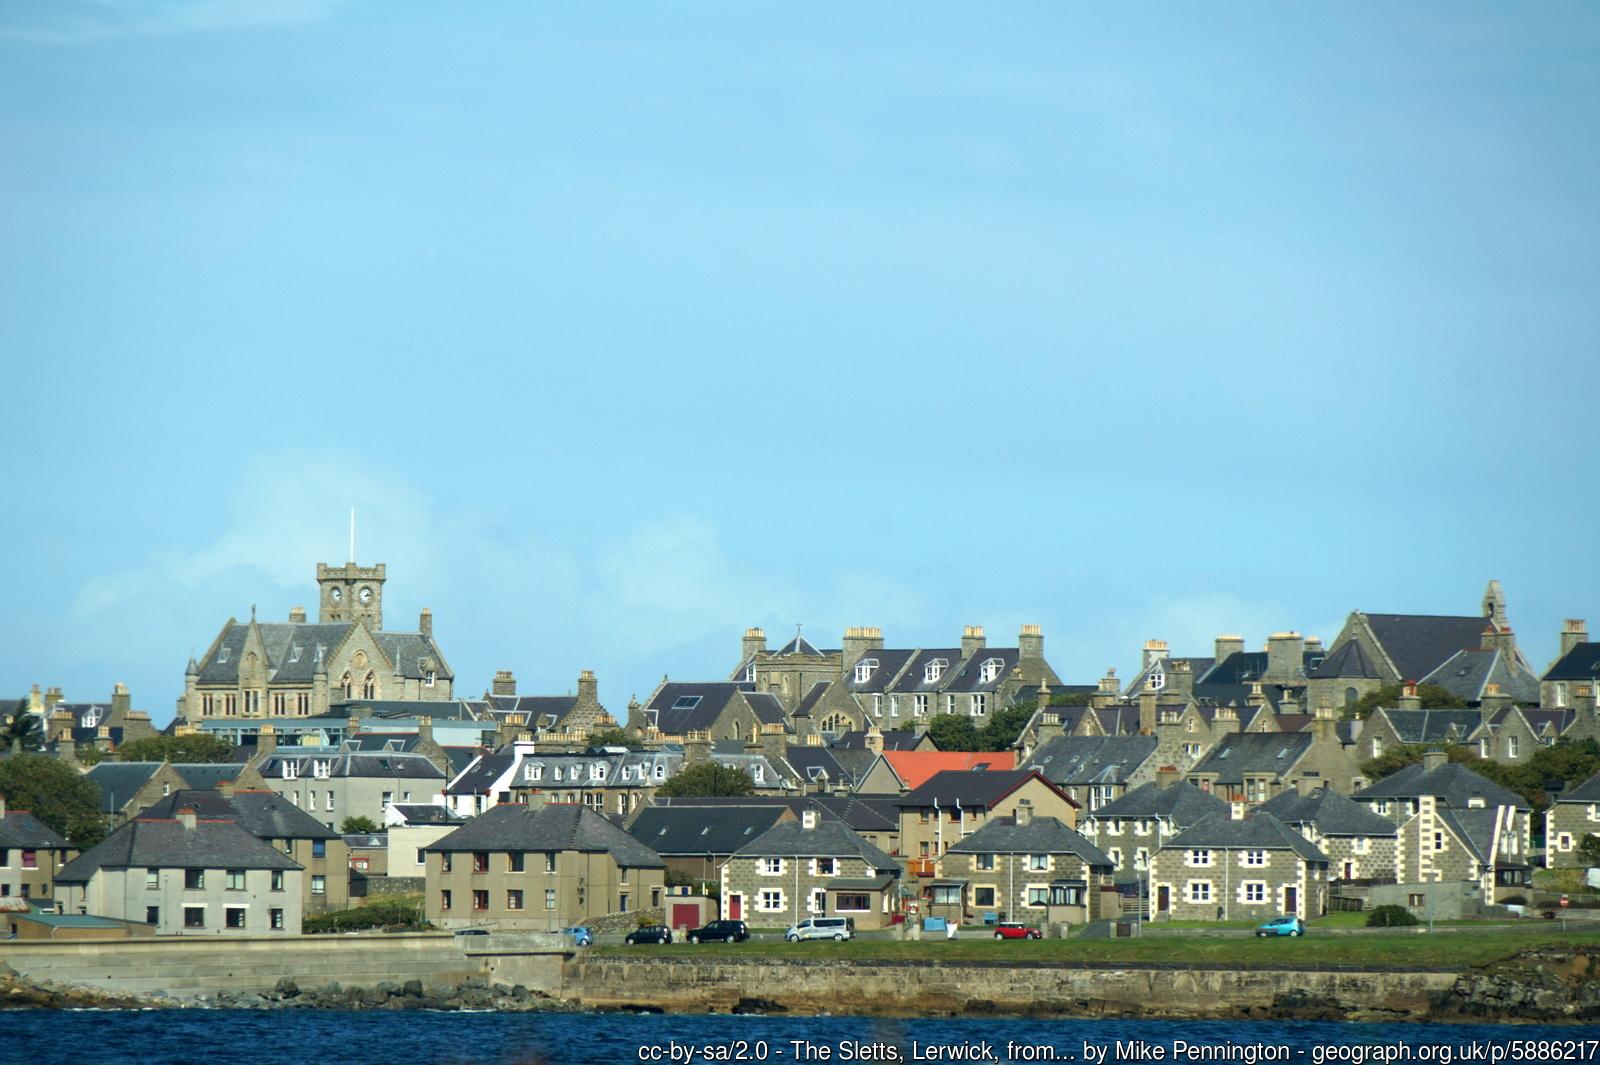 The Sletts, Lerwick, Shetland.